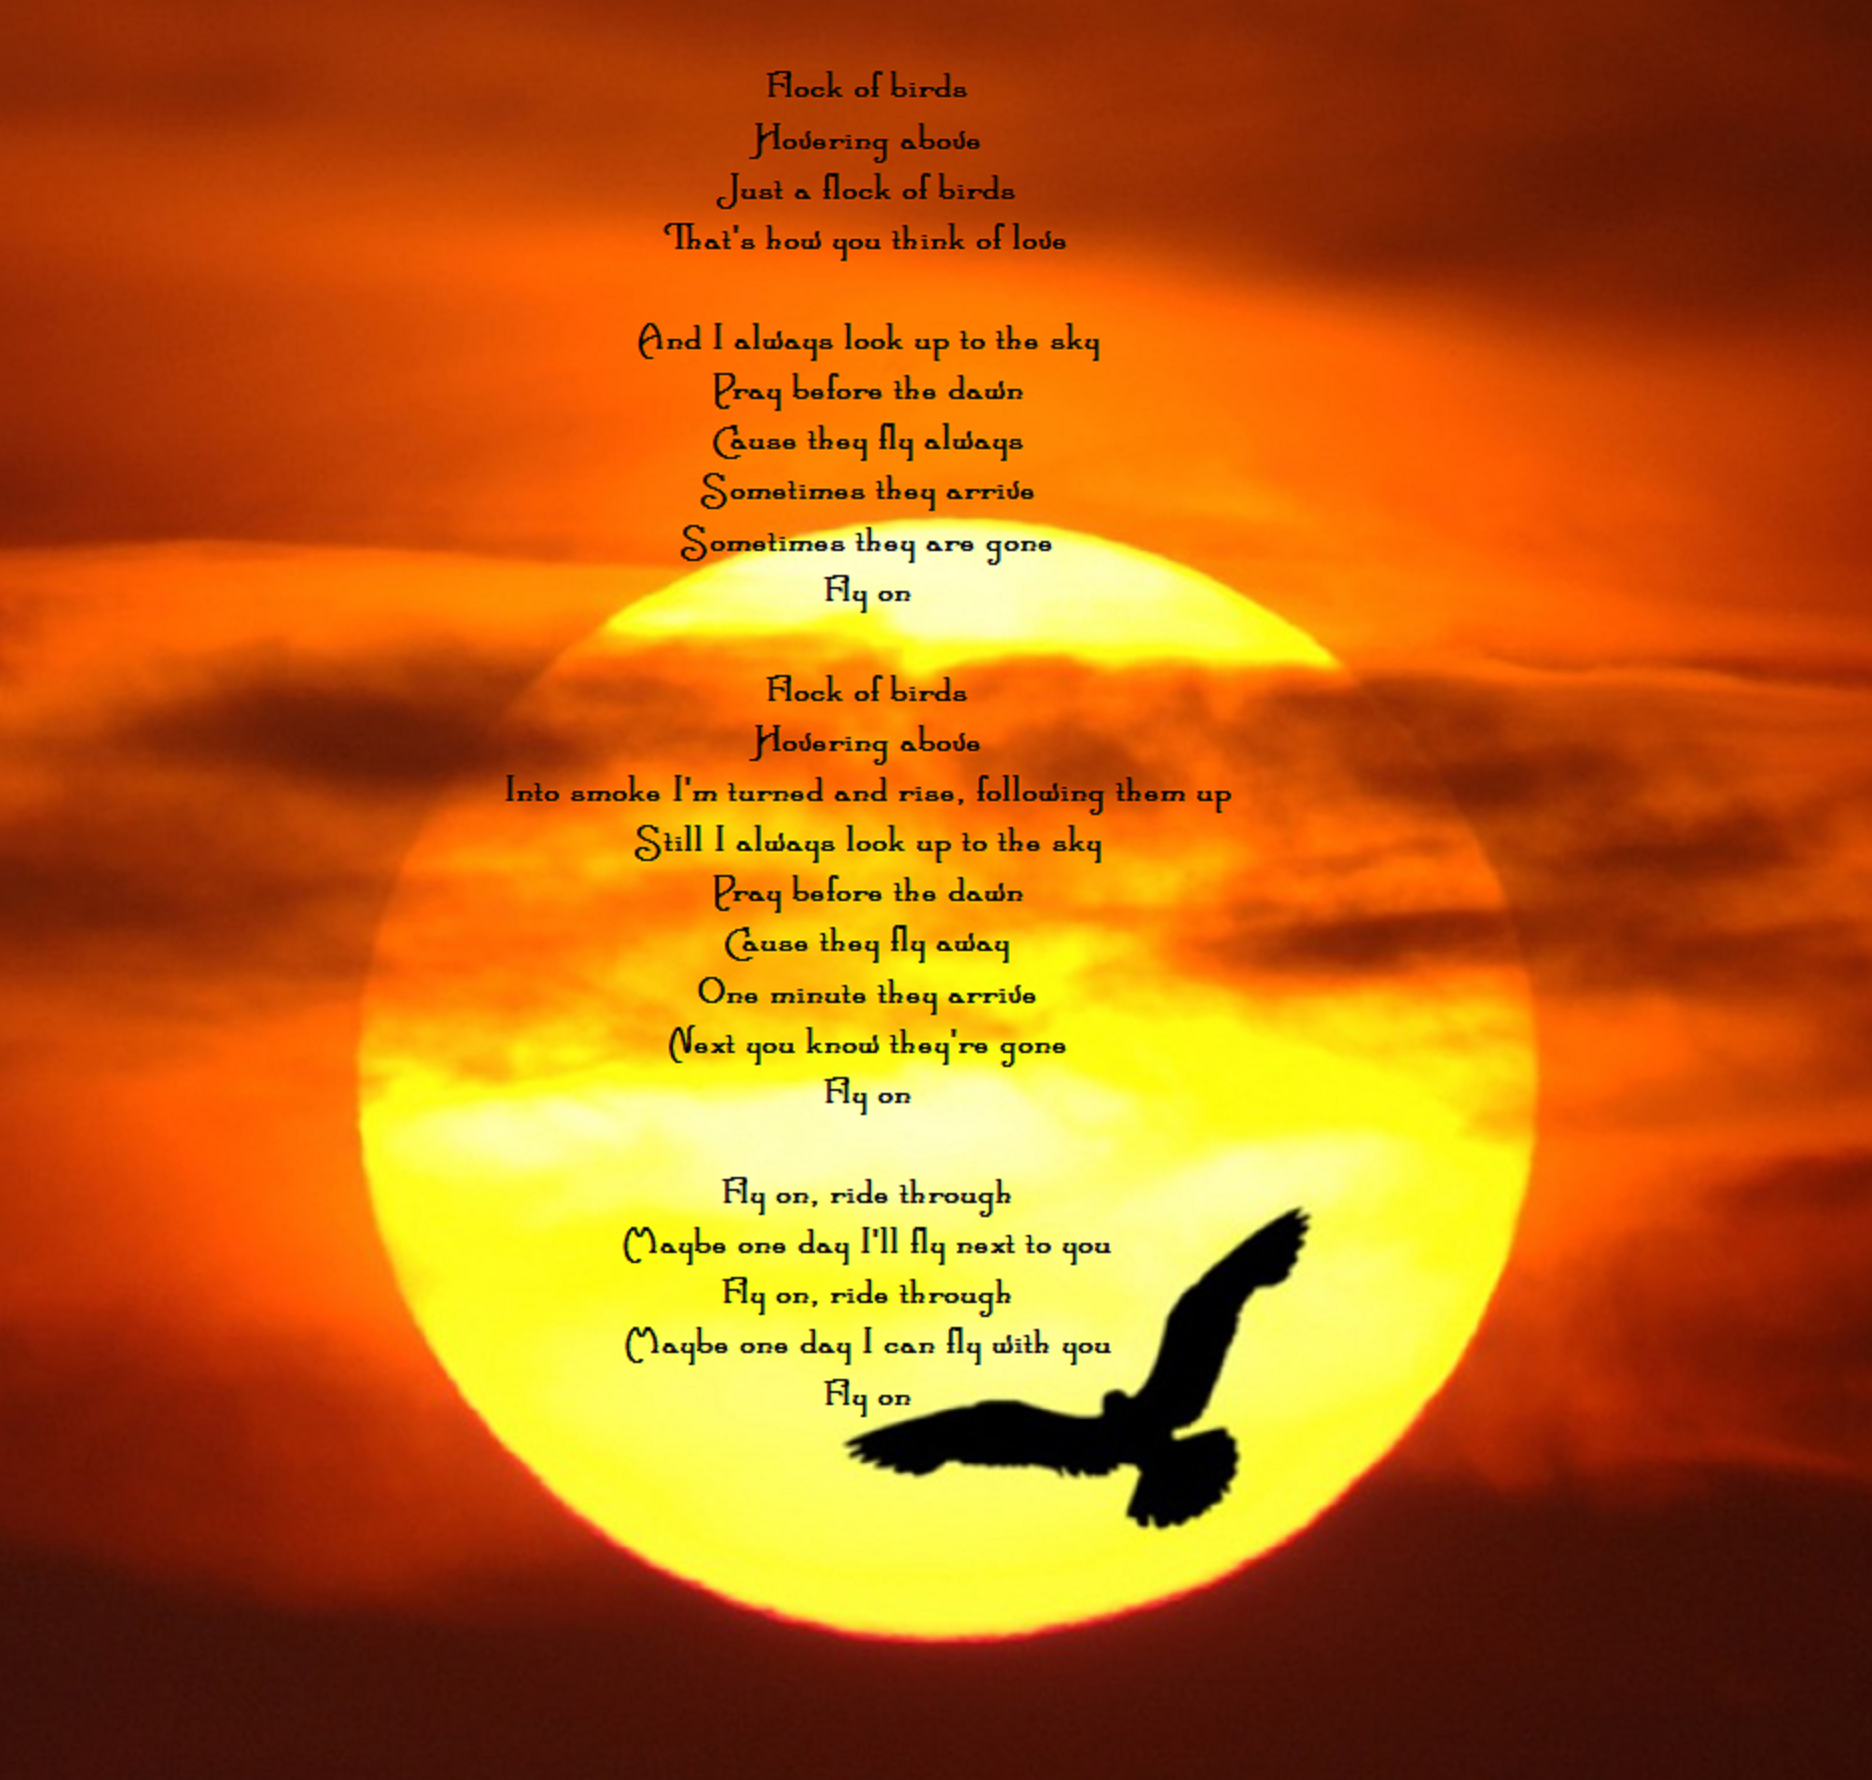 Christmas Light Coldplay Lyrics Triumph Bonneville T140v Wiring Diagram O Fly On Nice Pinterest